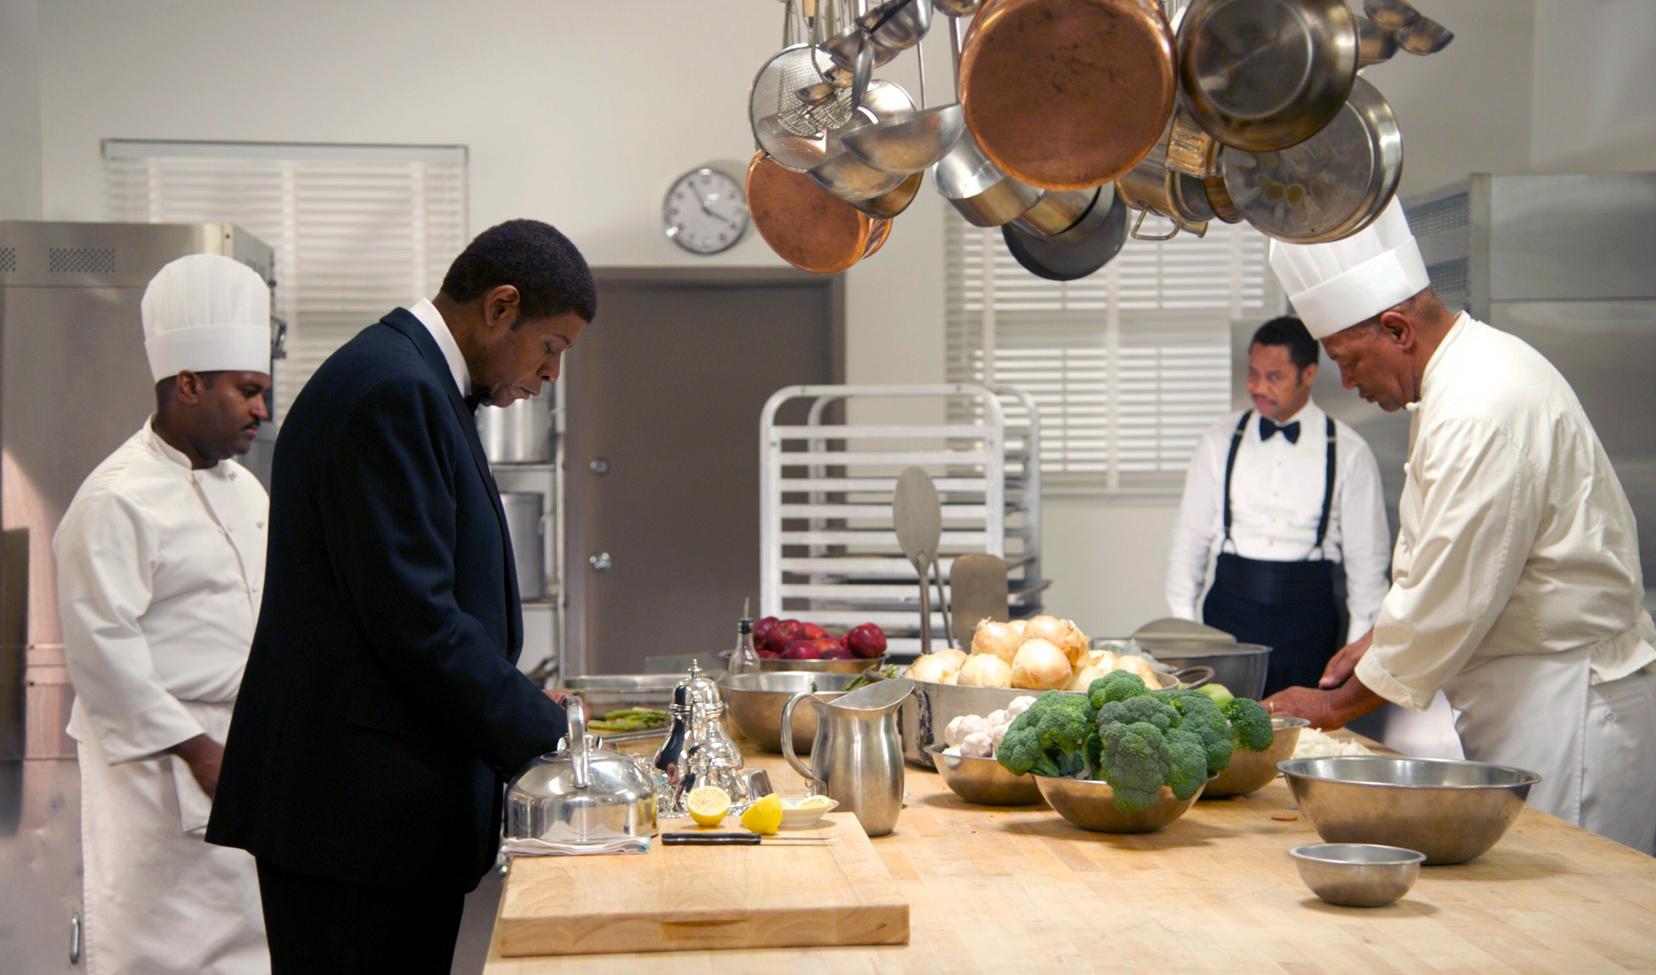 44 Cook Table1.jpg